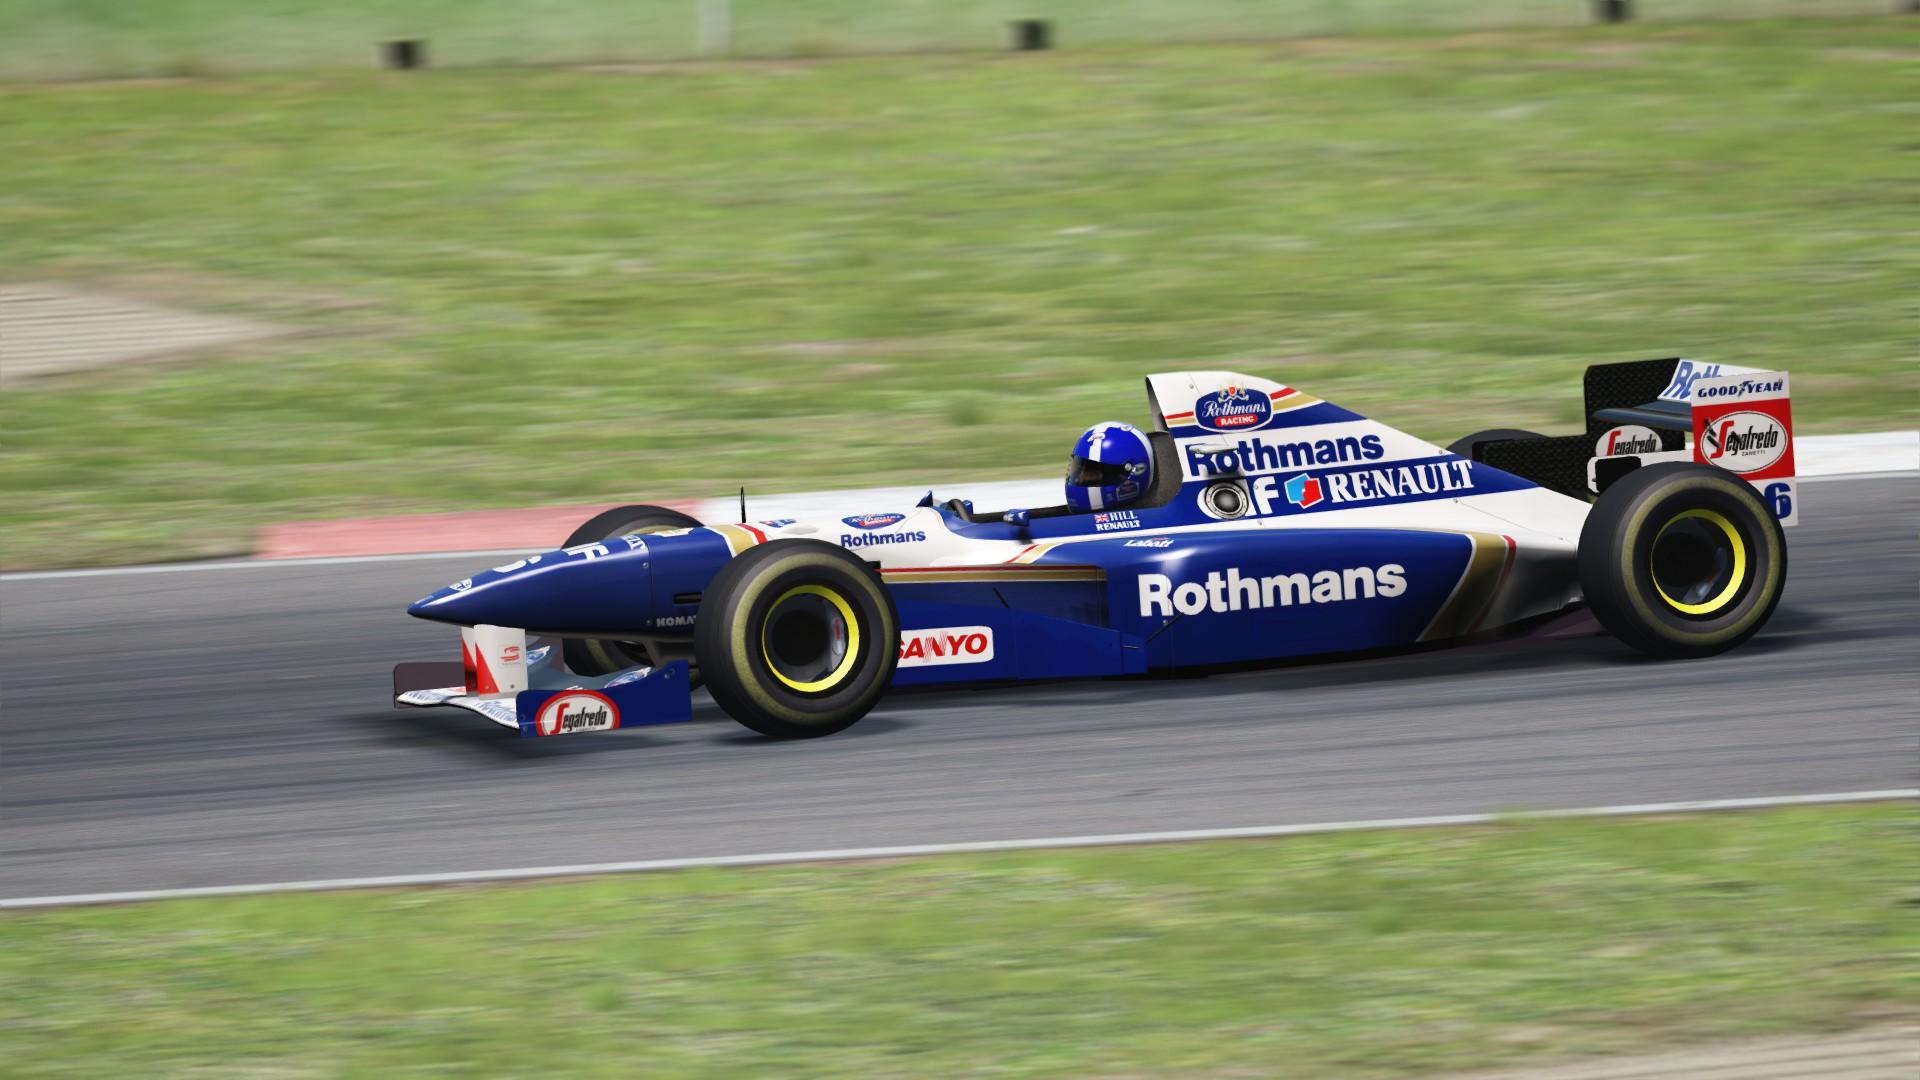 Assetto Corsa Grand Prix 1995 Mod – Assetto Corsa Mods